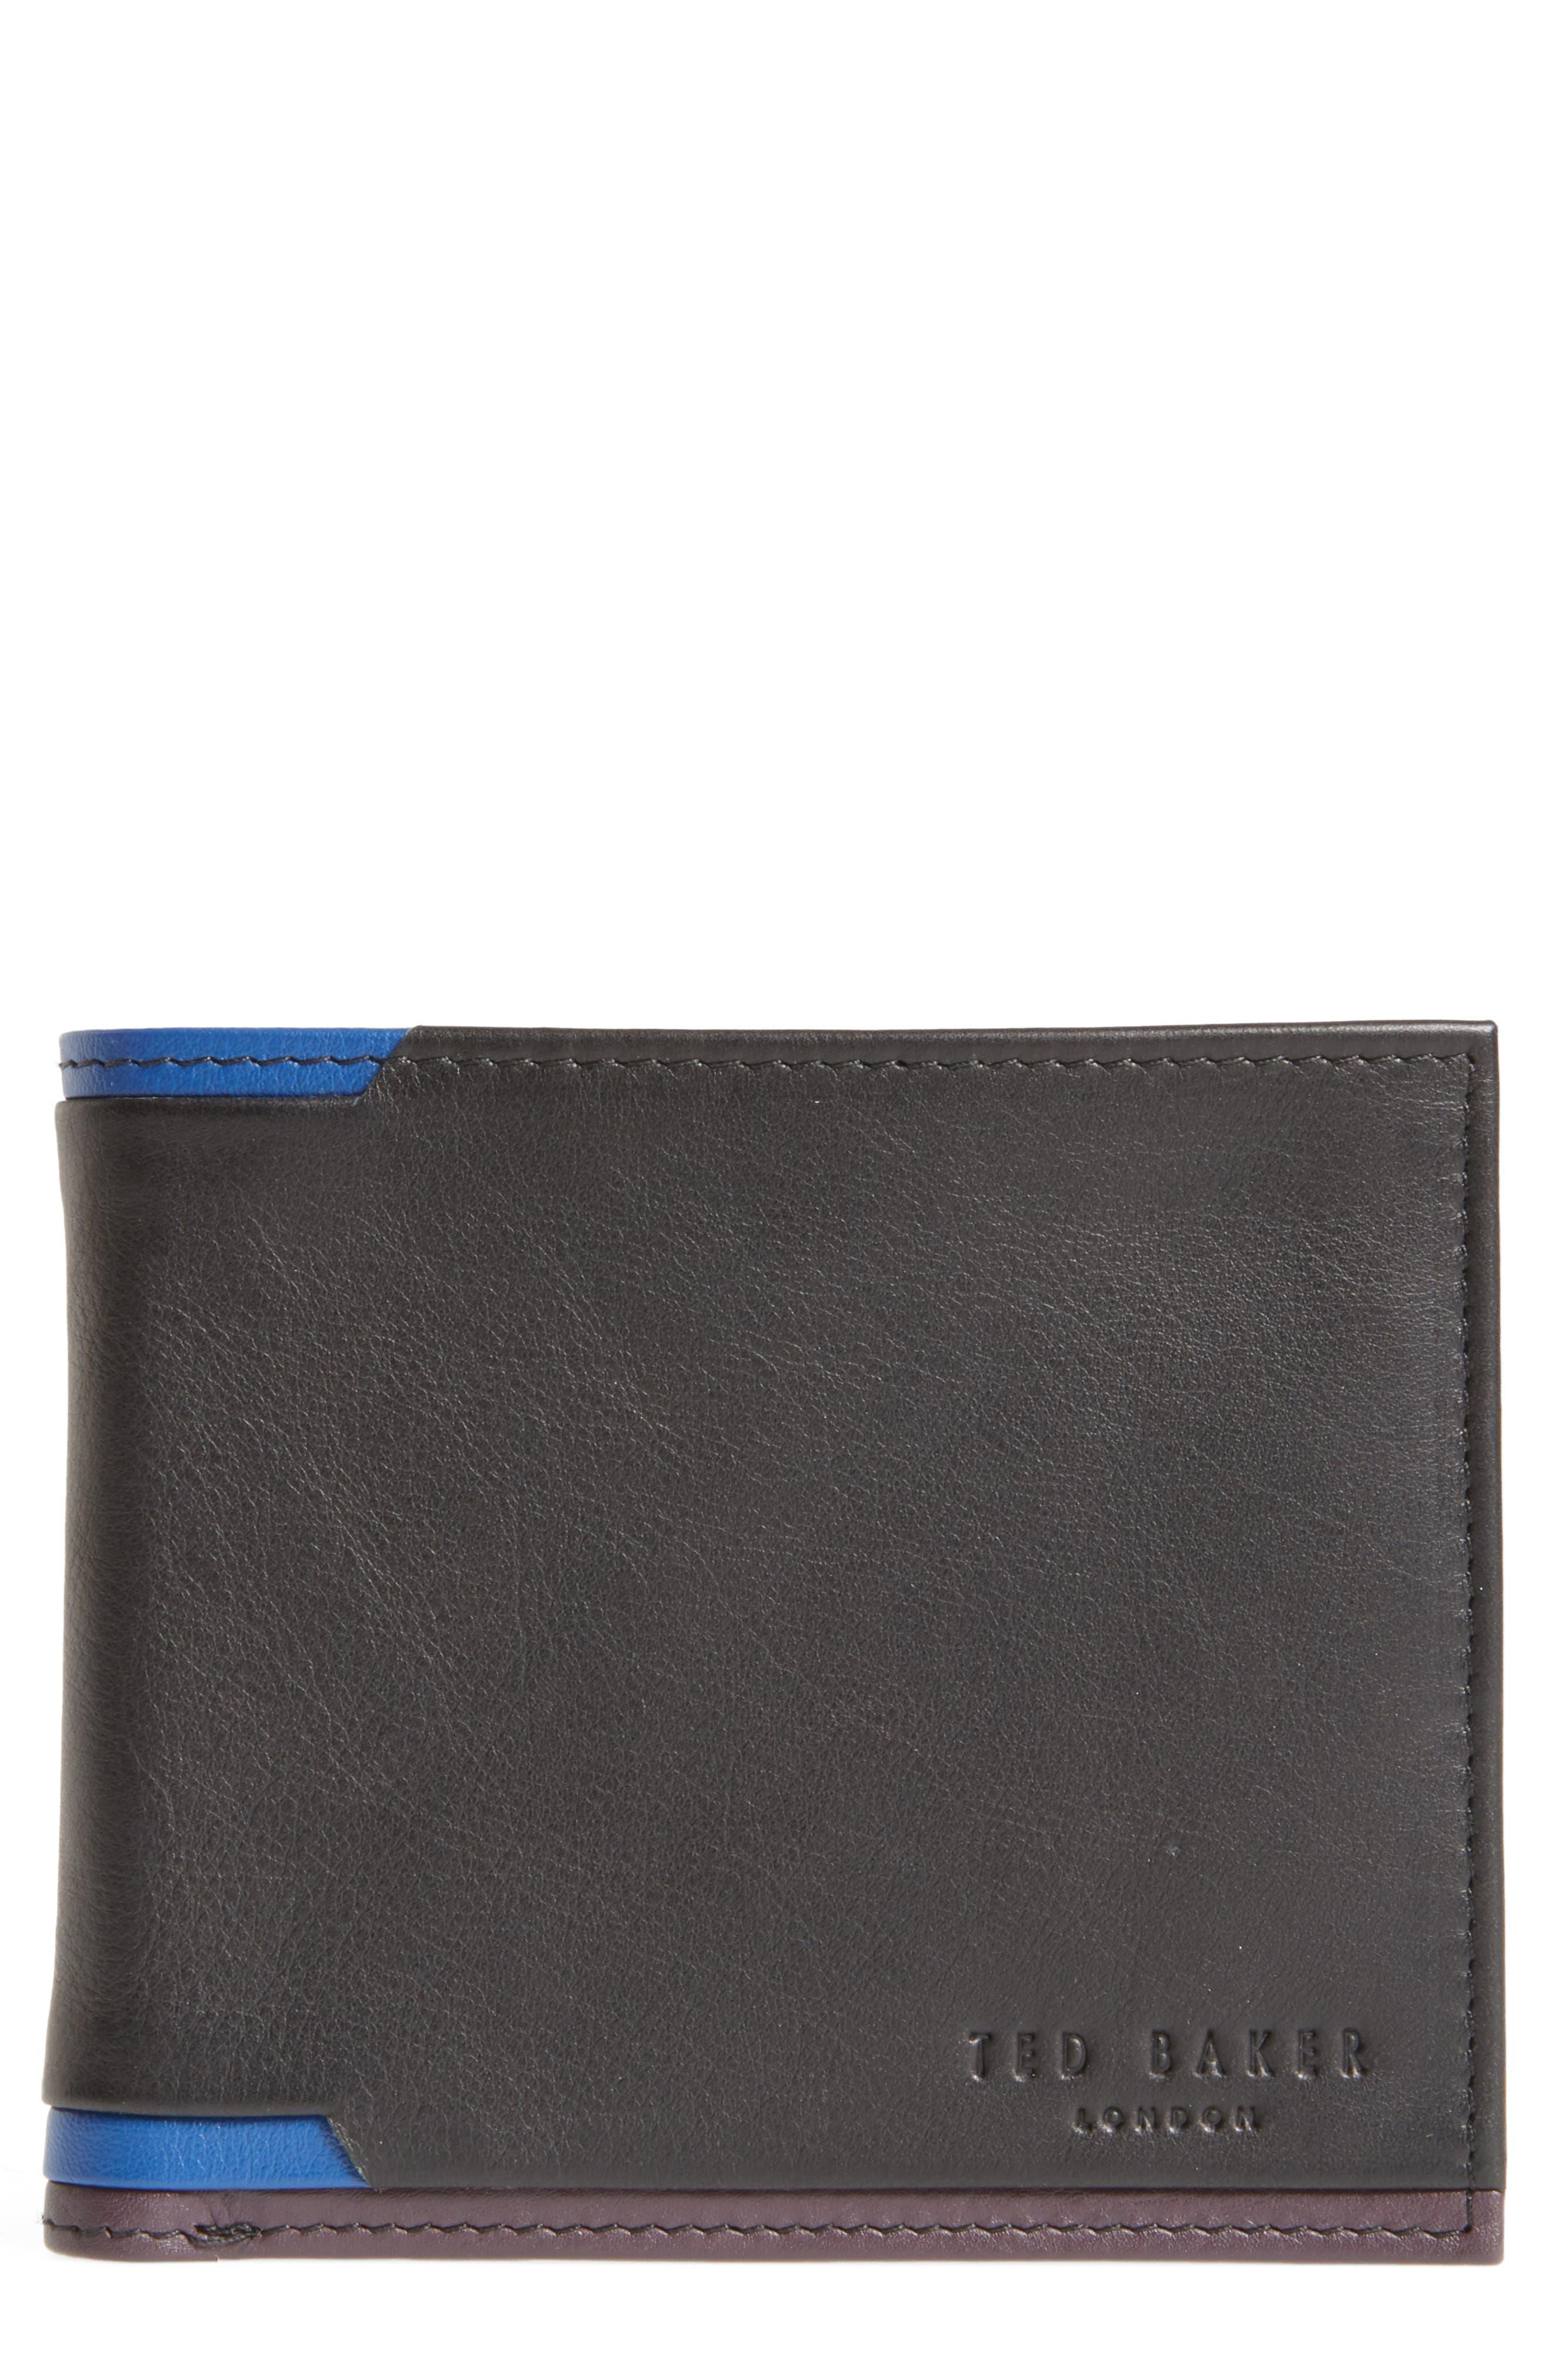 Baldi Corner Detail Leather Wallet,                         Main,                         color, Black